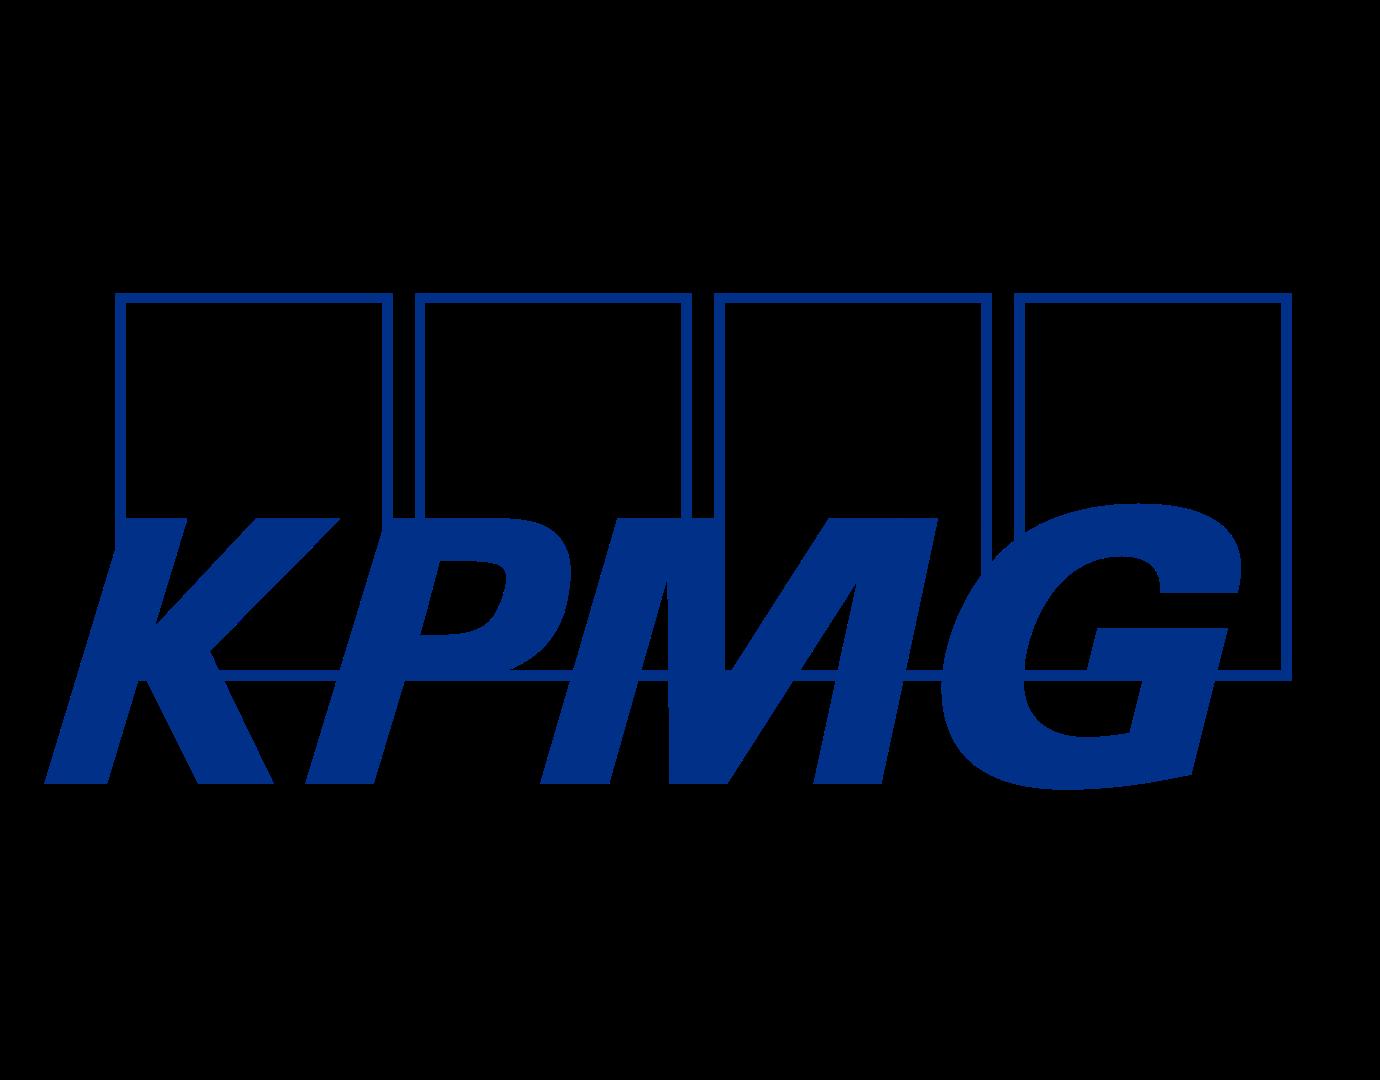 kpmg-logo for web.png